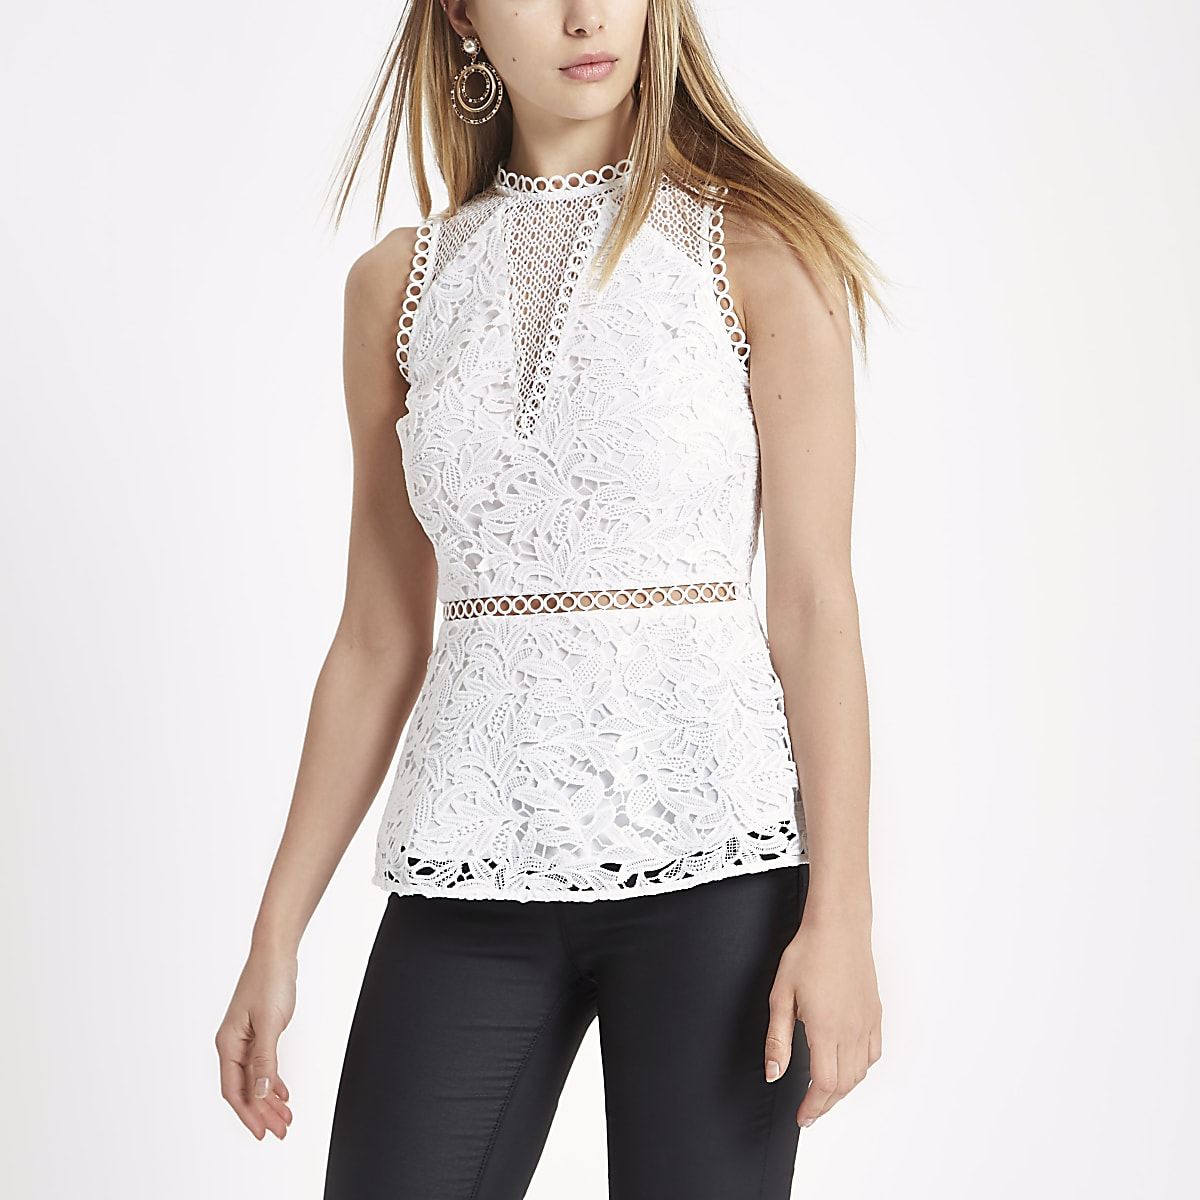 ba0148131c2b41 White lace sleeveless peplum top - Blouses - Tops - women